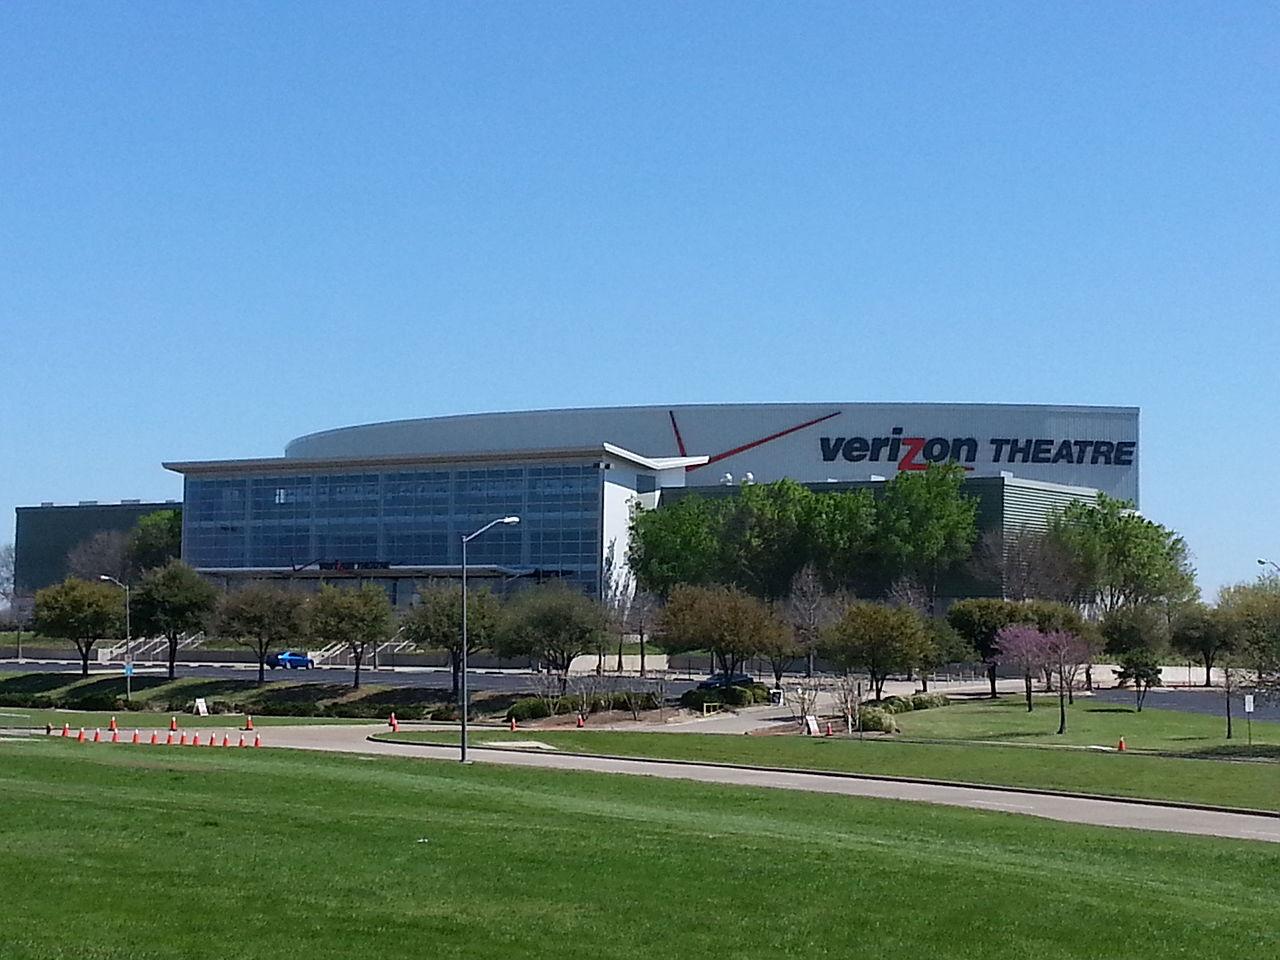 1280px-Verizon_Theatre.jpg